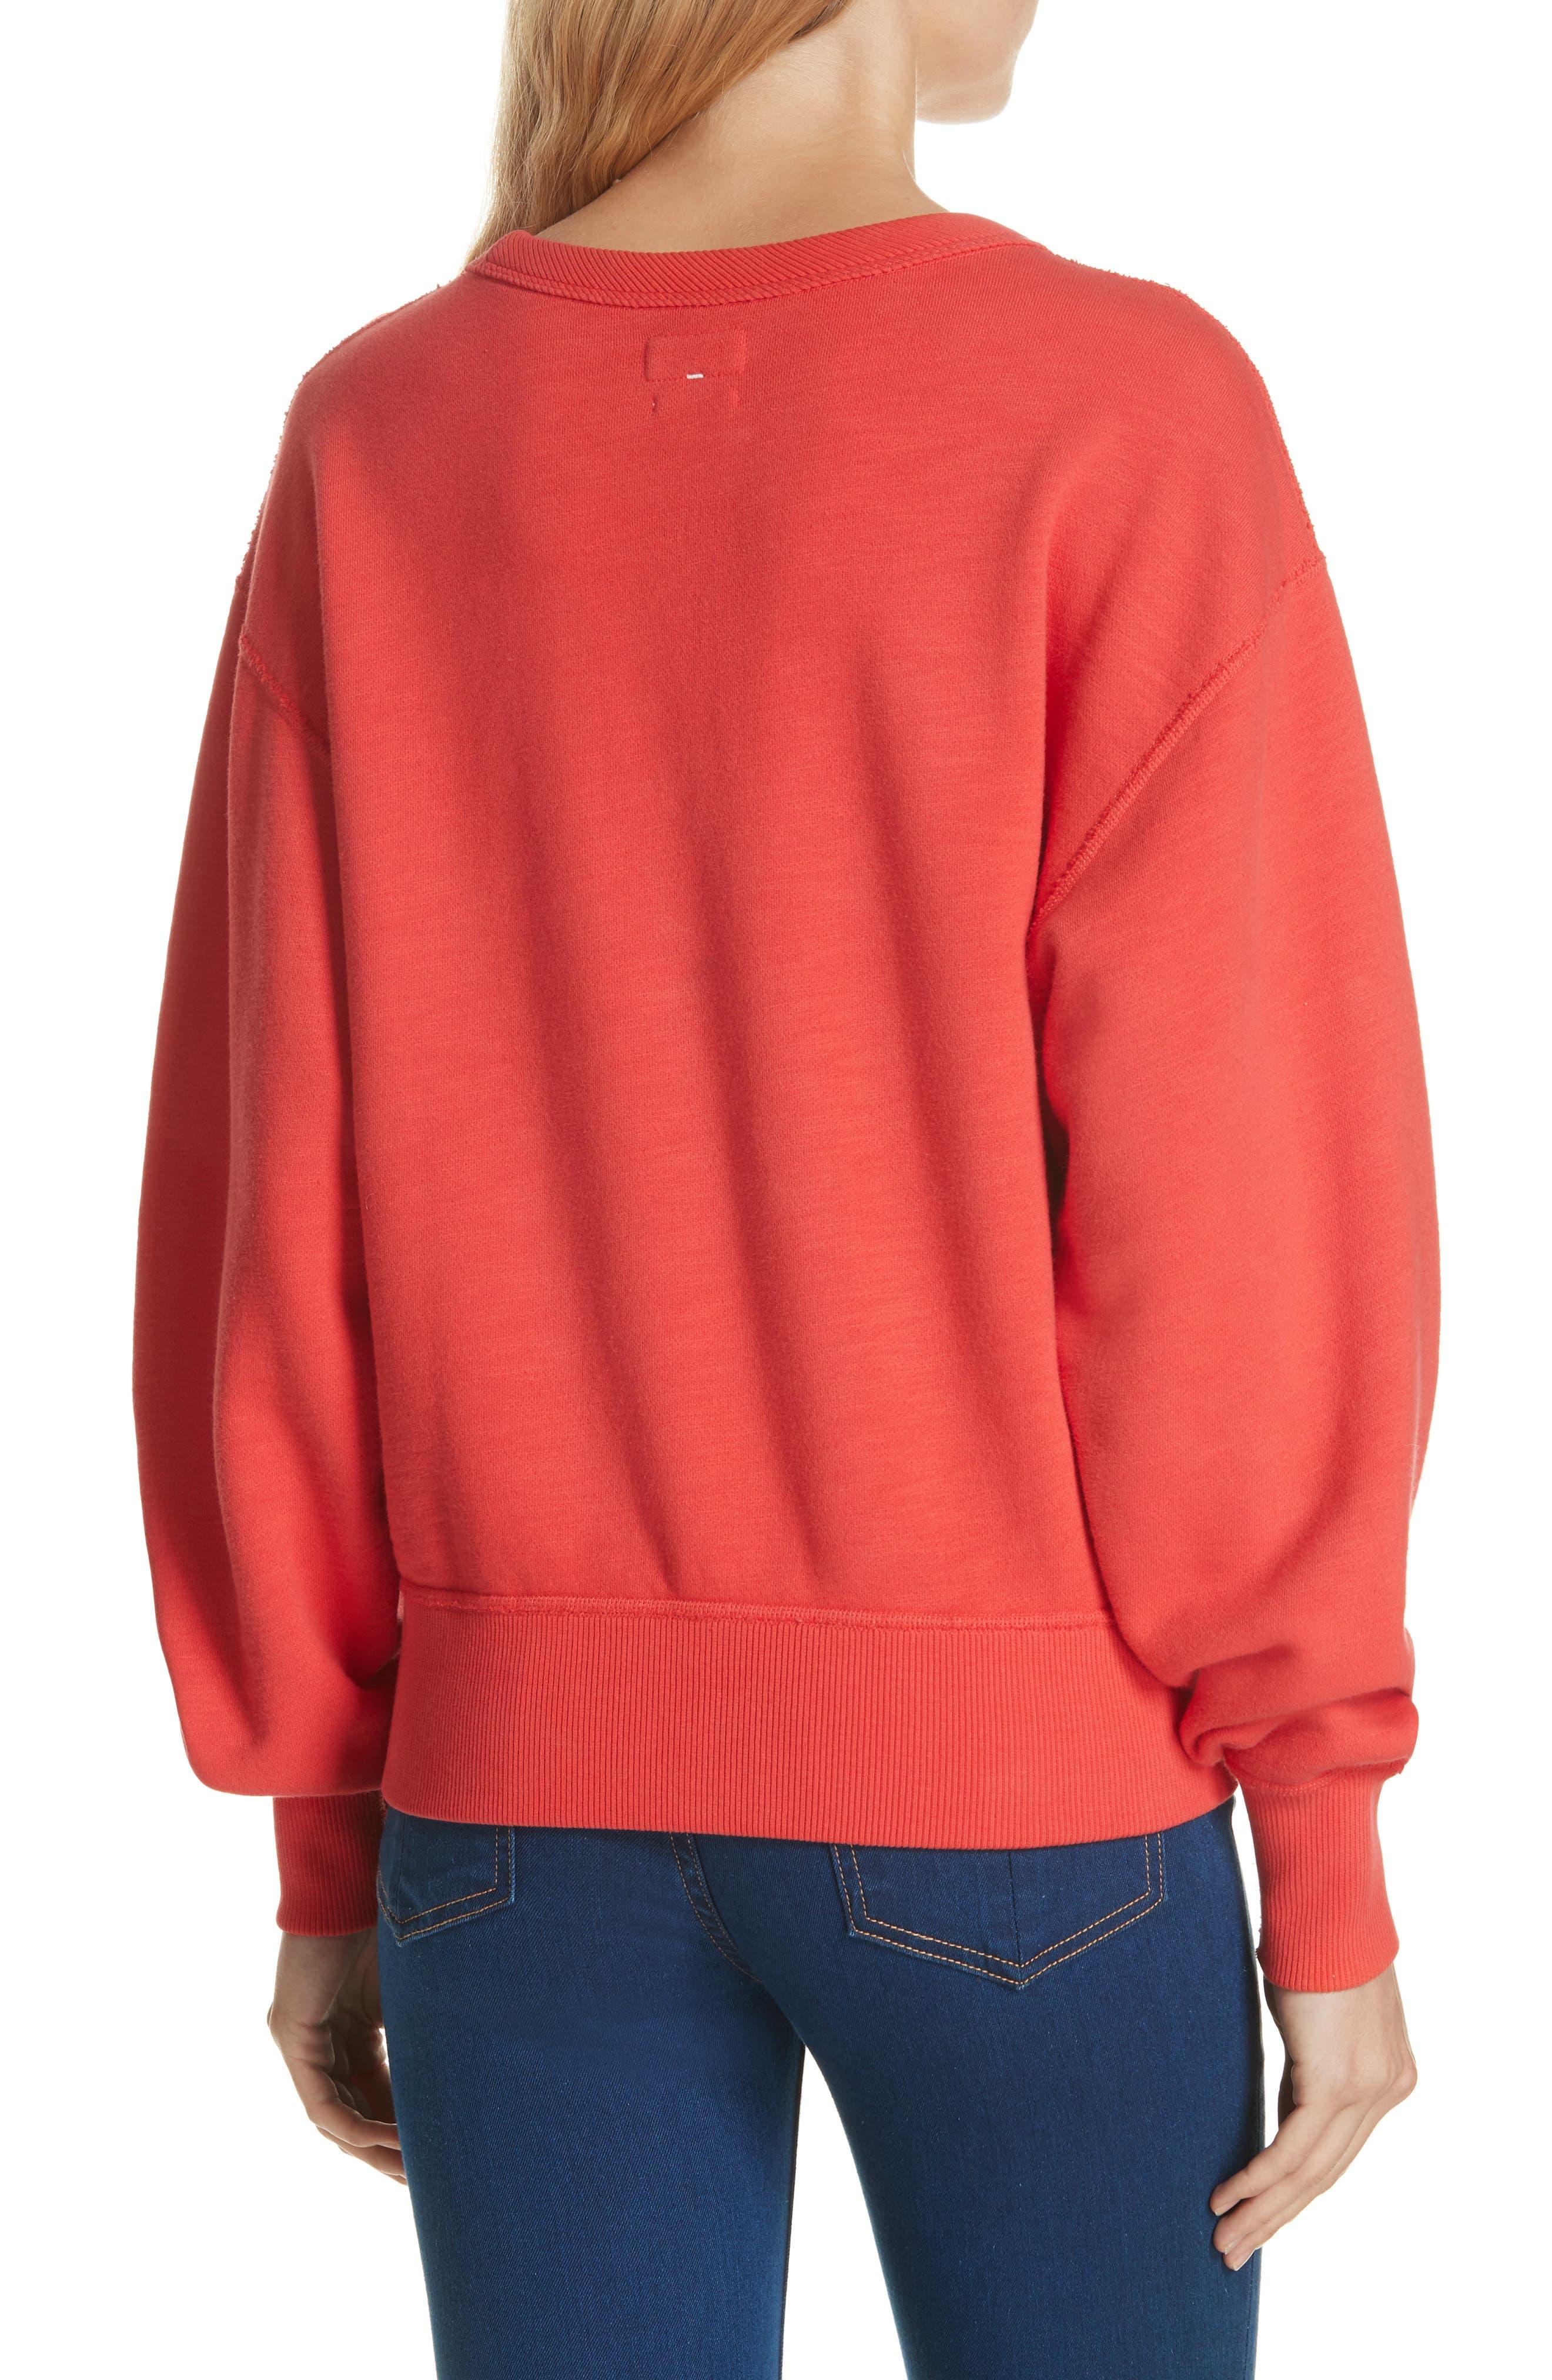 rag & bone Hello Sweatshirt,                             Alternate thumbnail 2, color,                             950